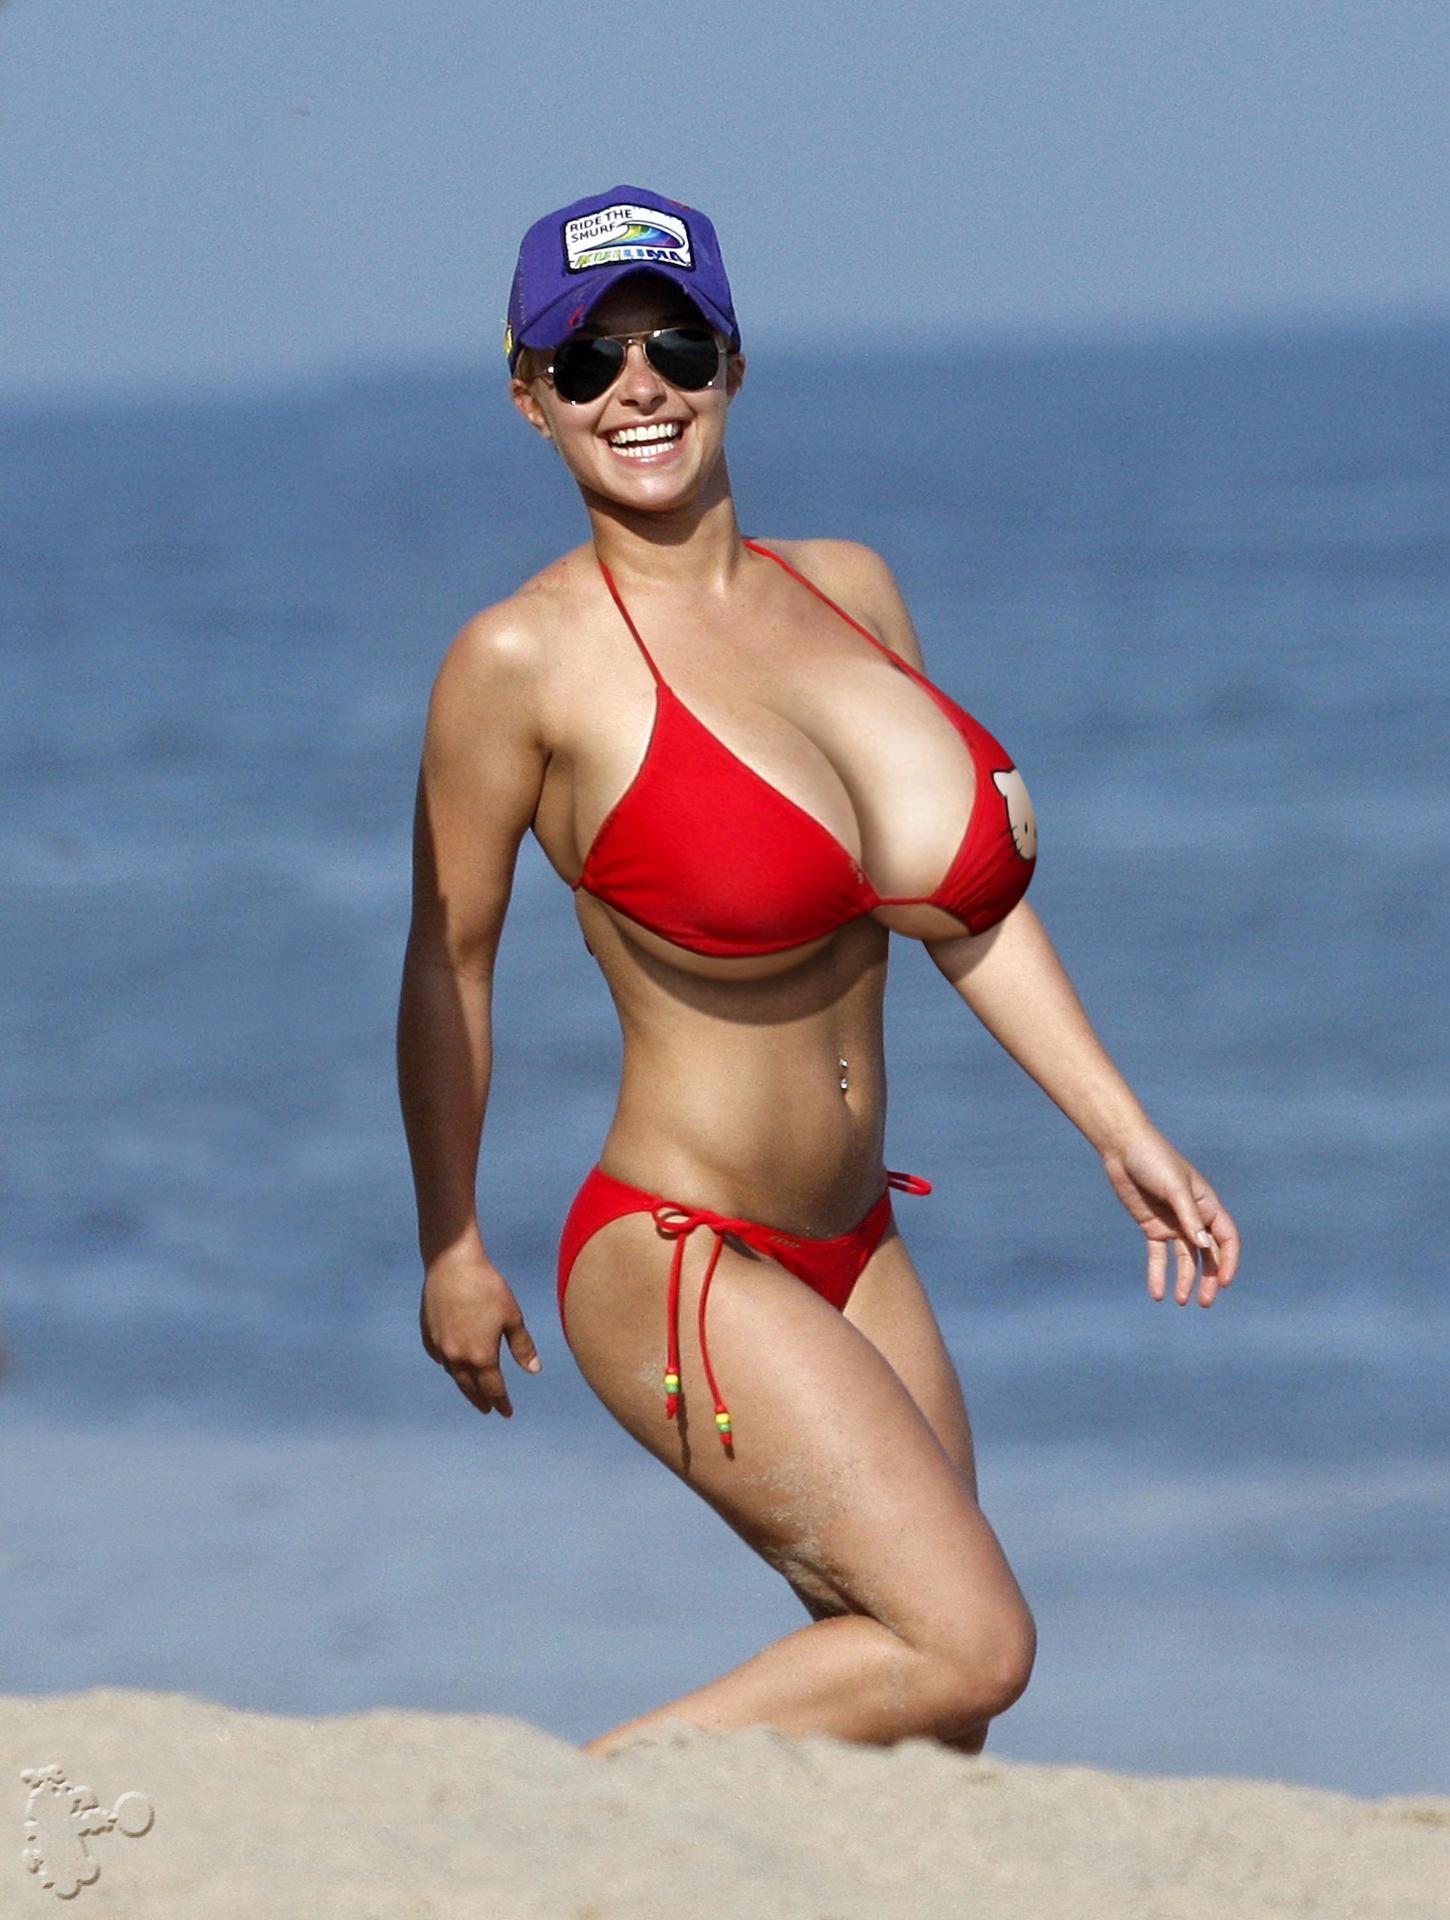 Hayden-Panettiere-Malibu-Beach-4-gz